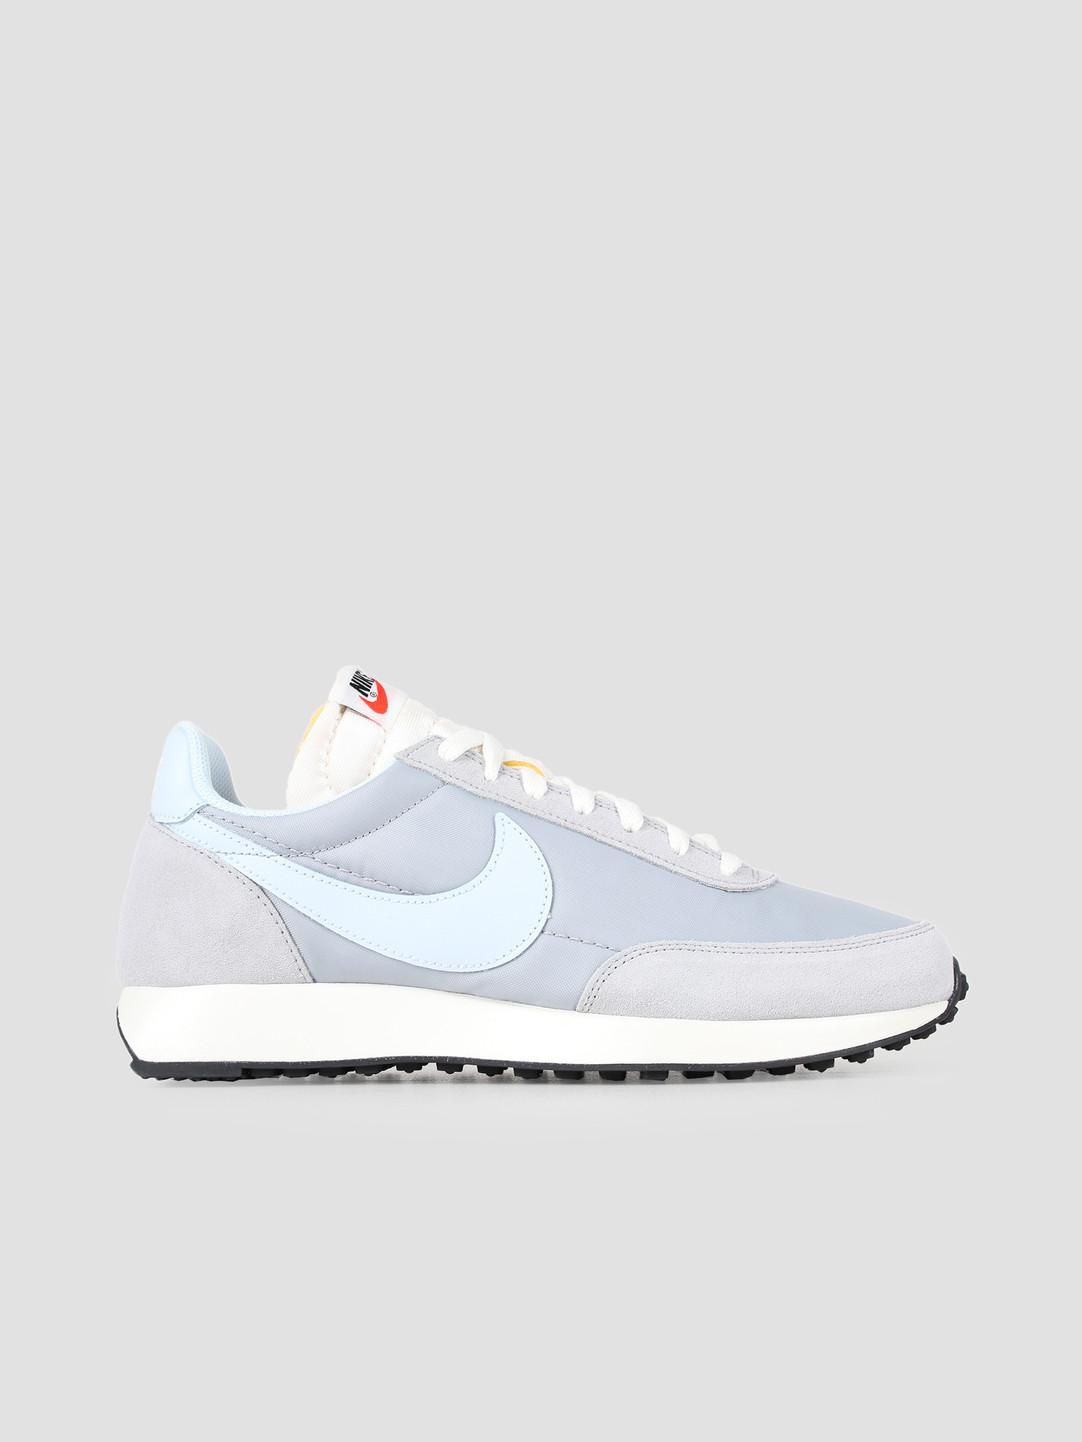 best sneakers 81855 0145f Nike Air Tailwind 79 Wolf Grey Antarctica Sail Black 487754-010